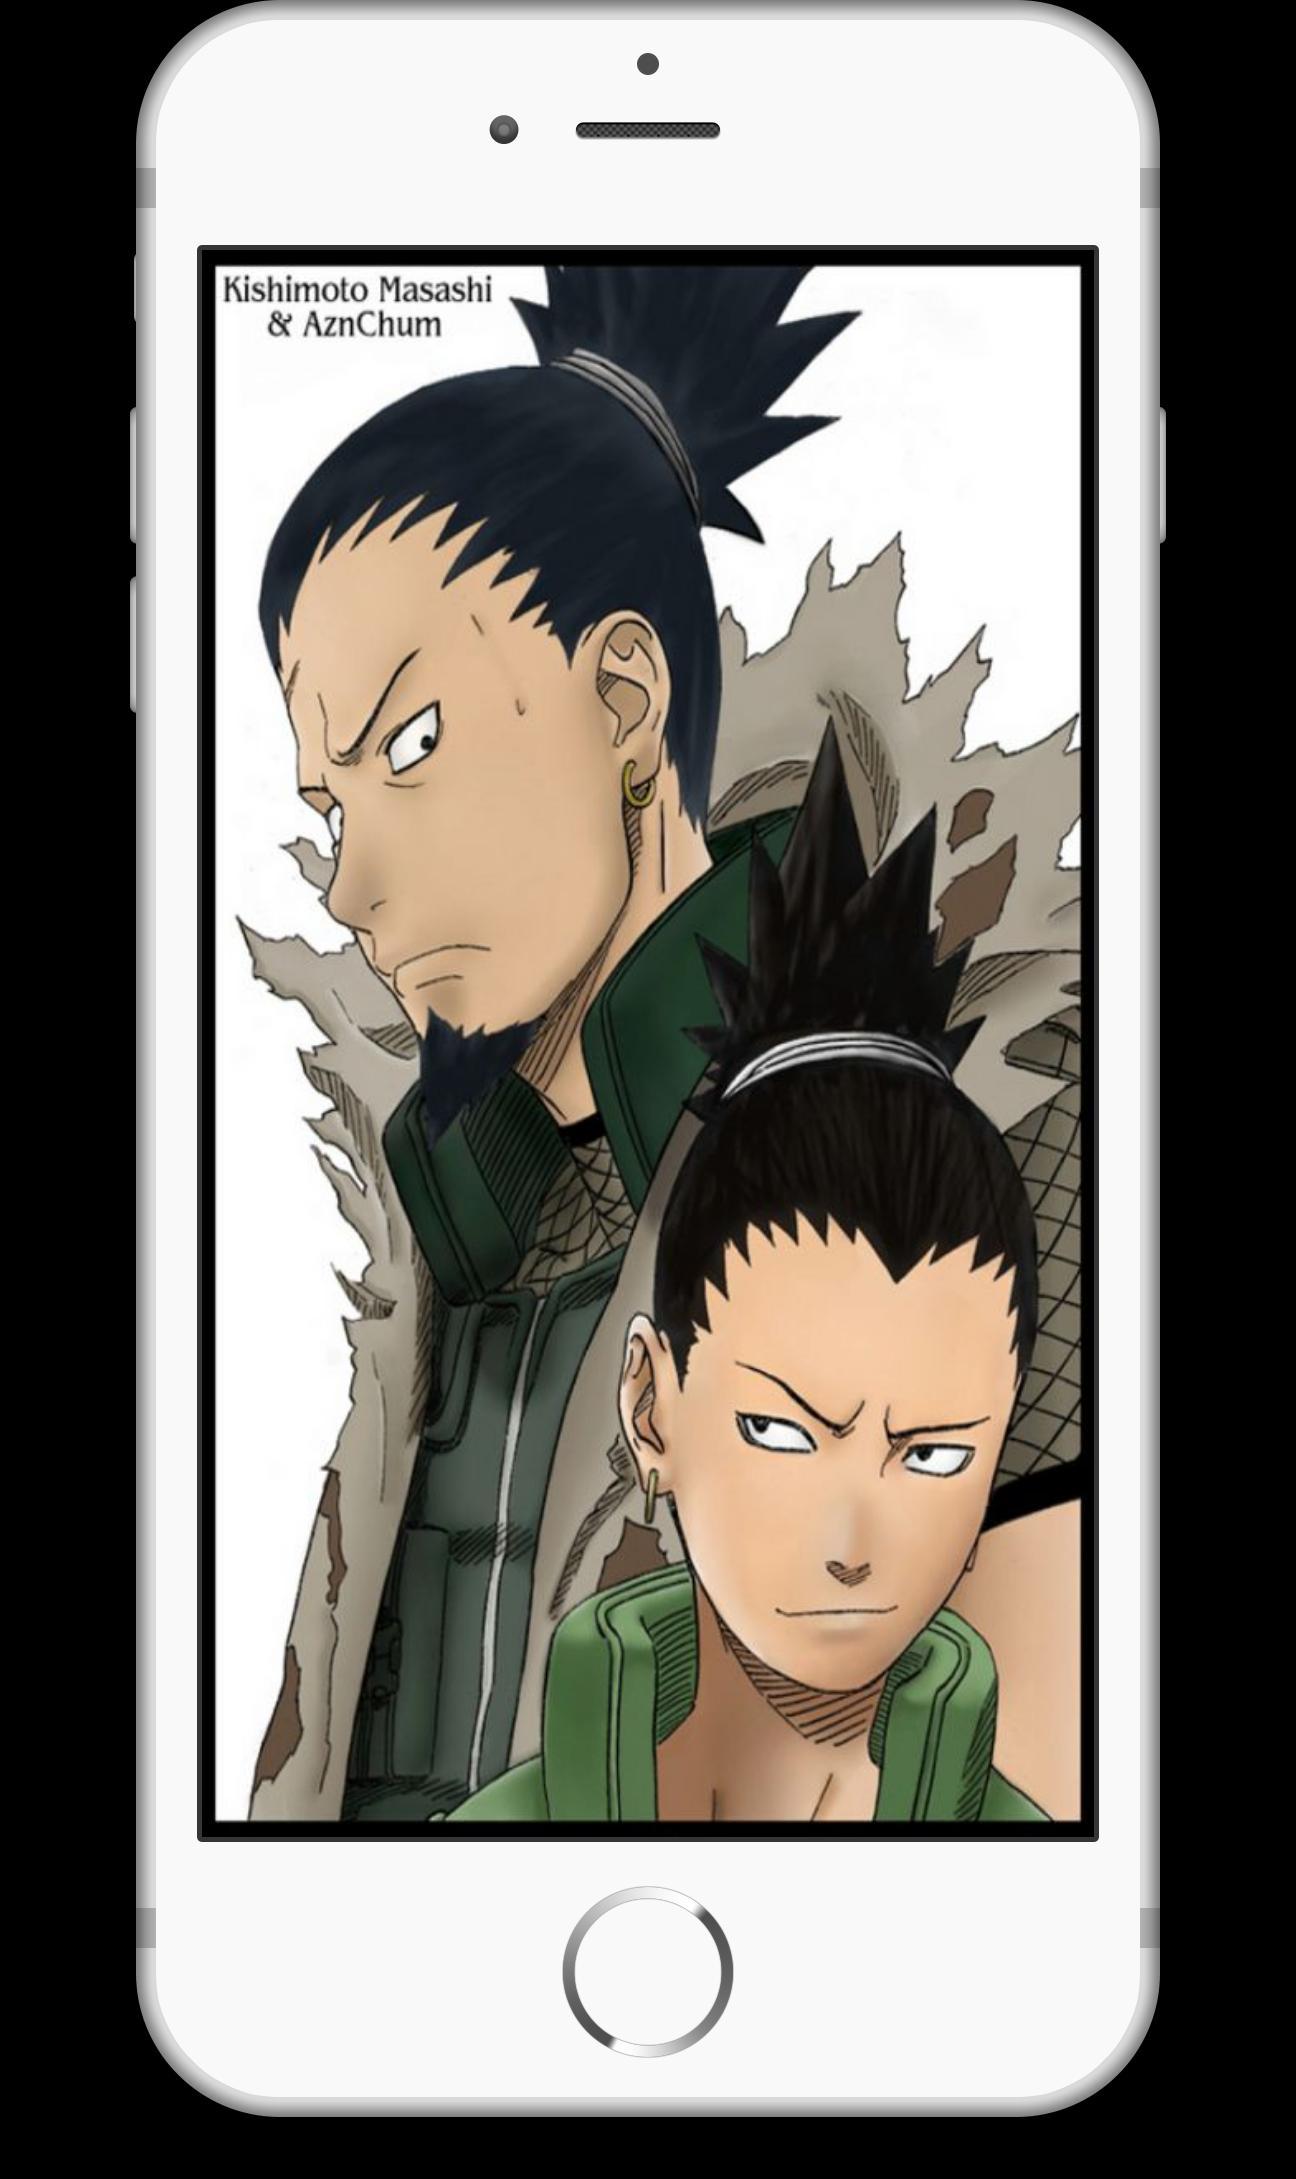 Shikamaru Nara Anime Wallpaper Hd For Android Apk Download